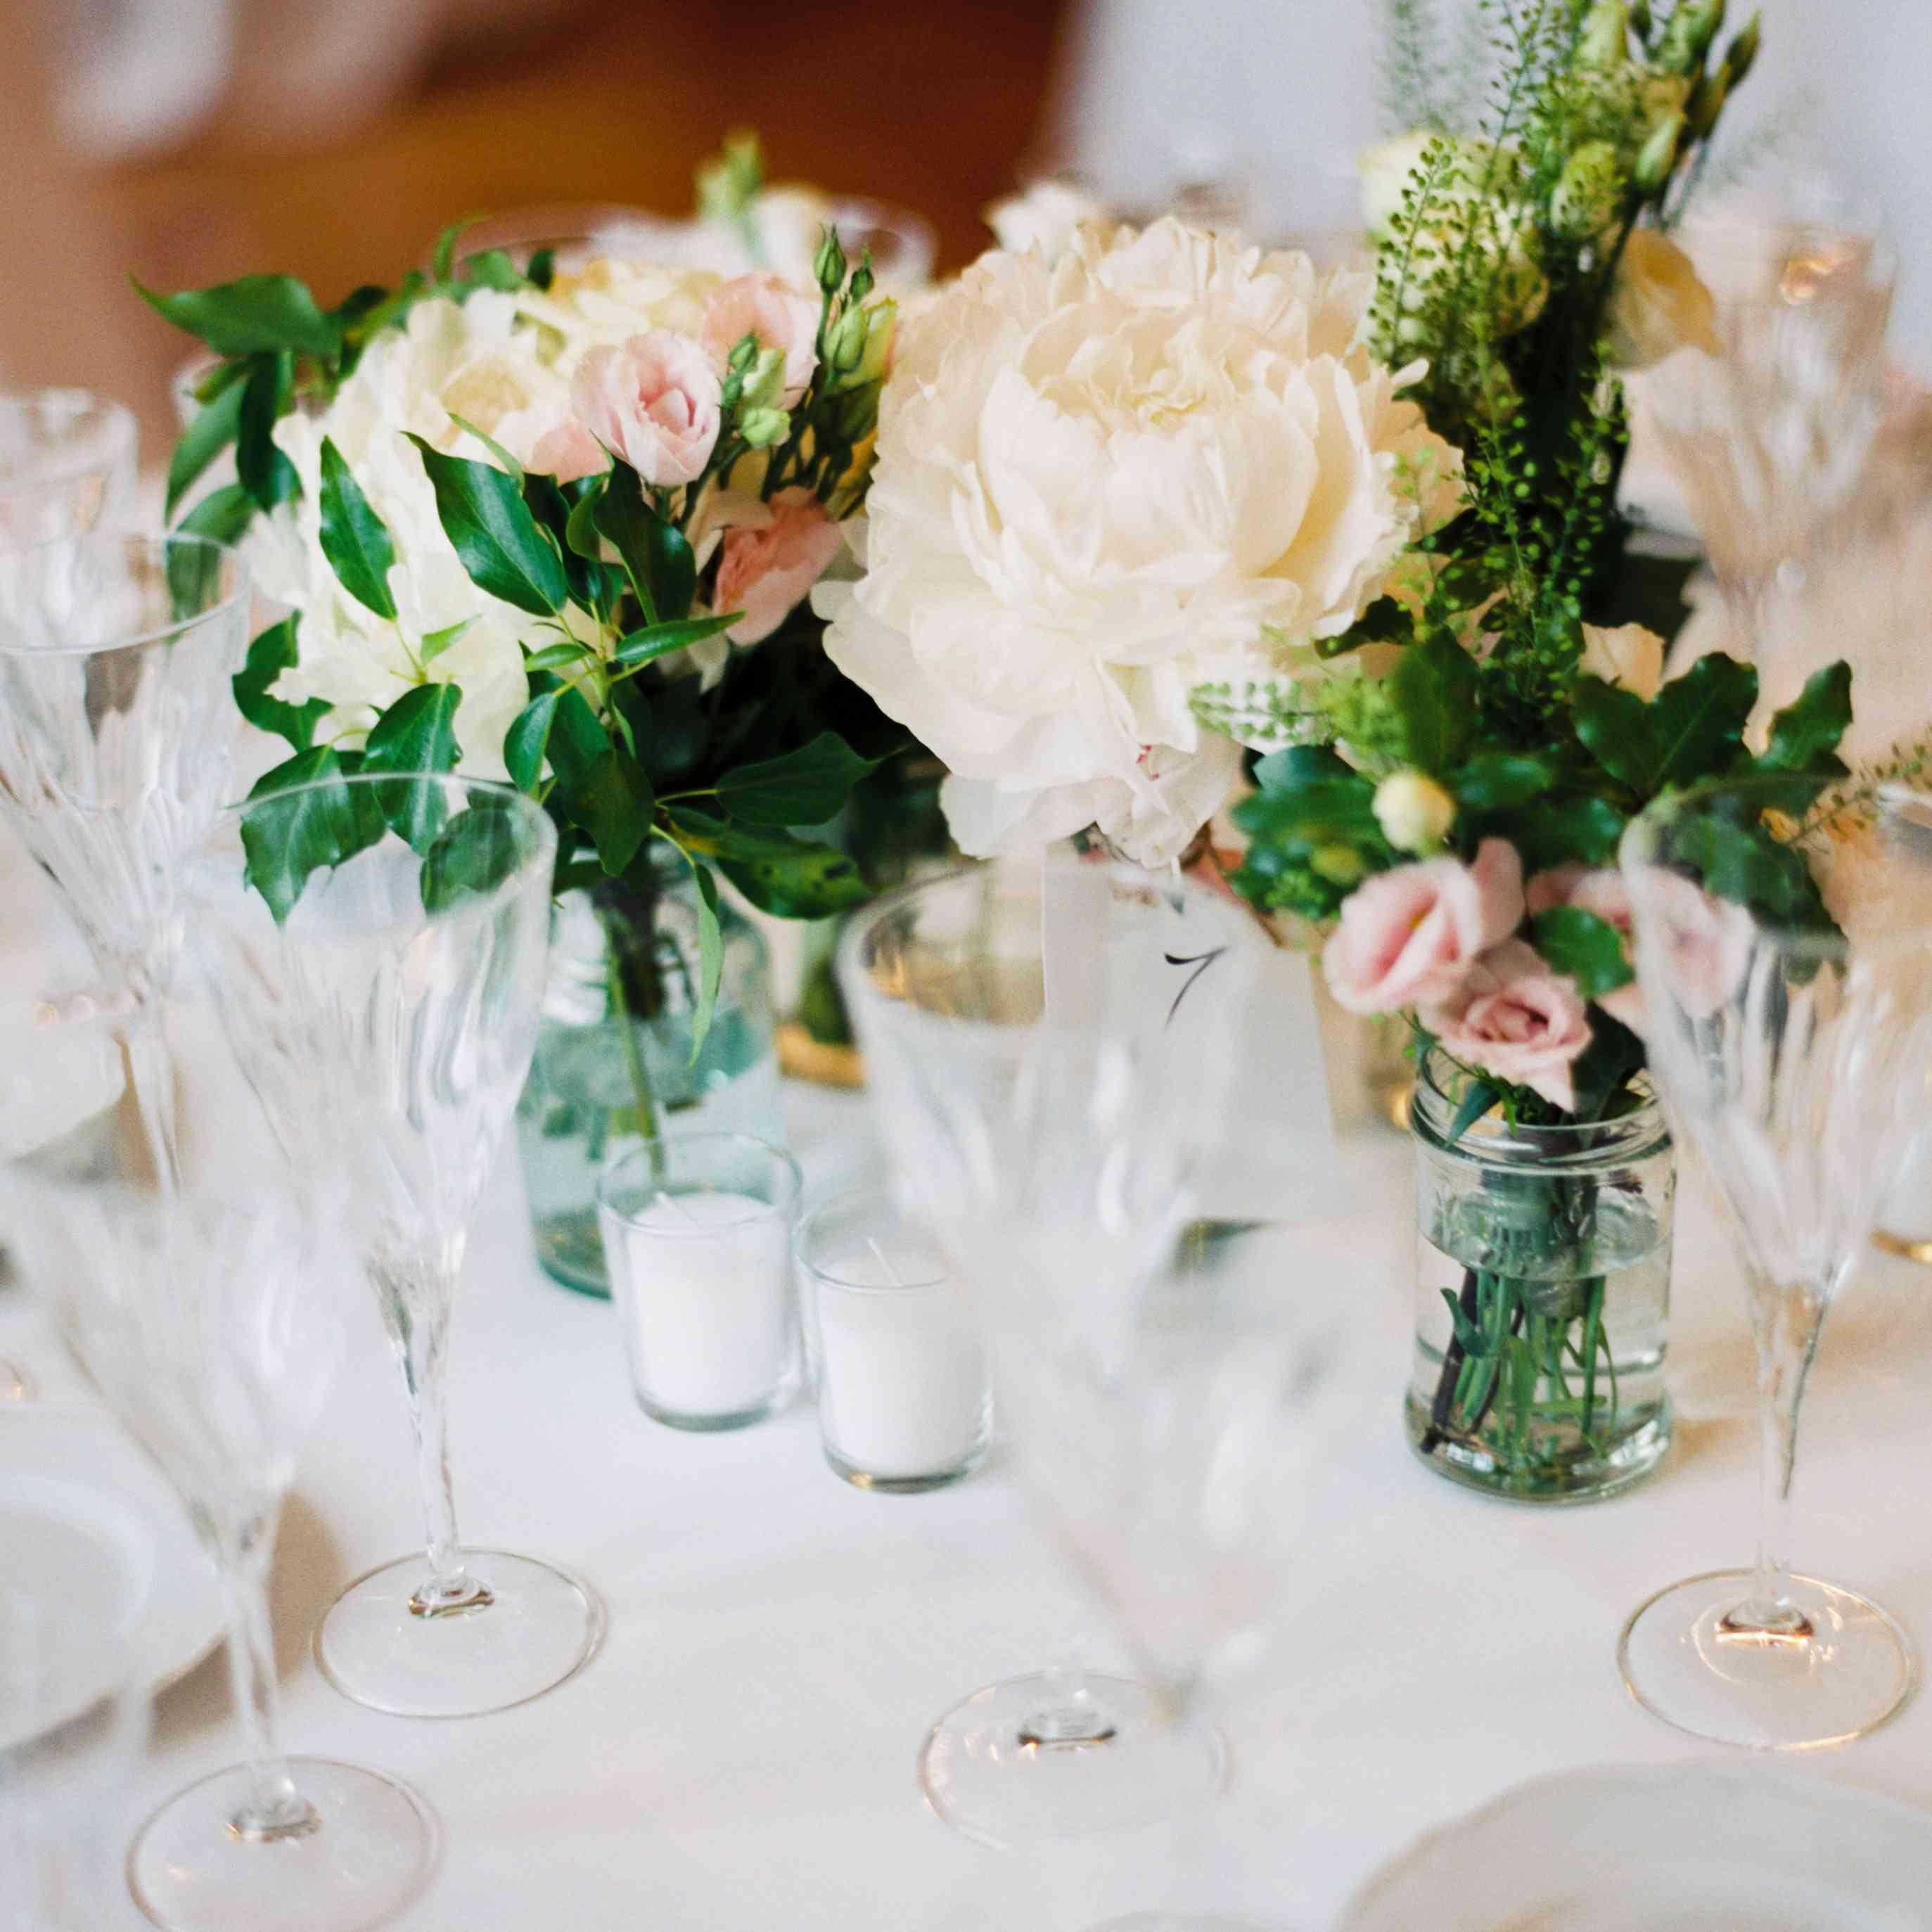 Northern Italian Wedding, Center Pieces